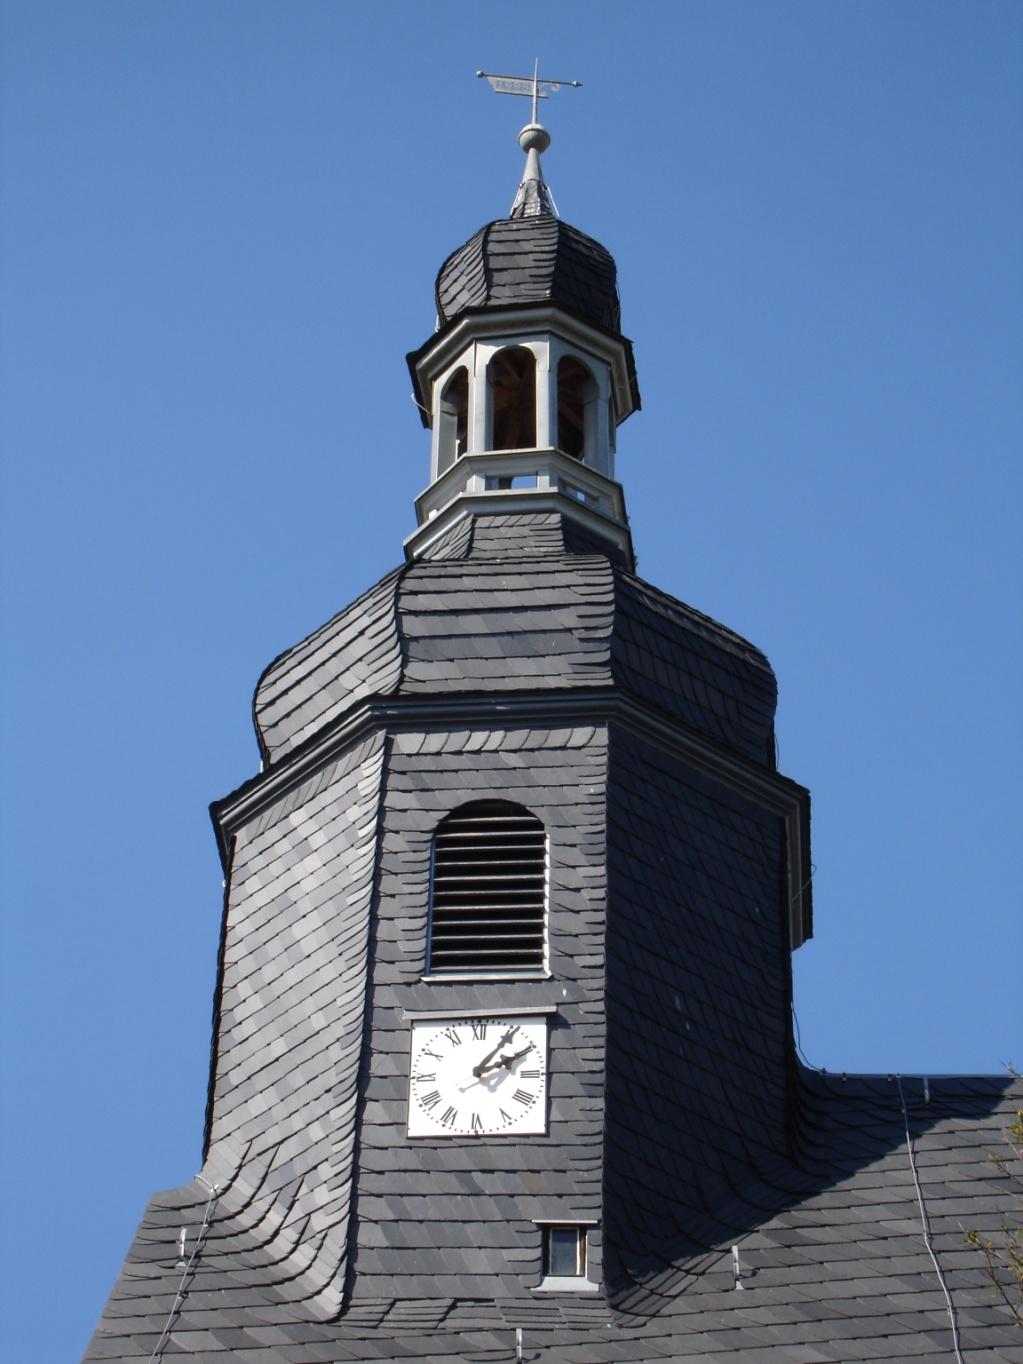 1999 neue Kirchturmspitze wurde angebracht